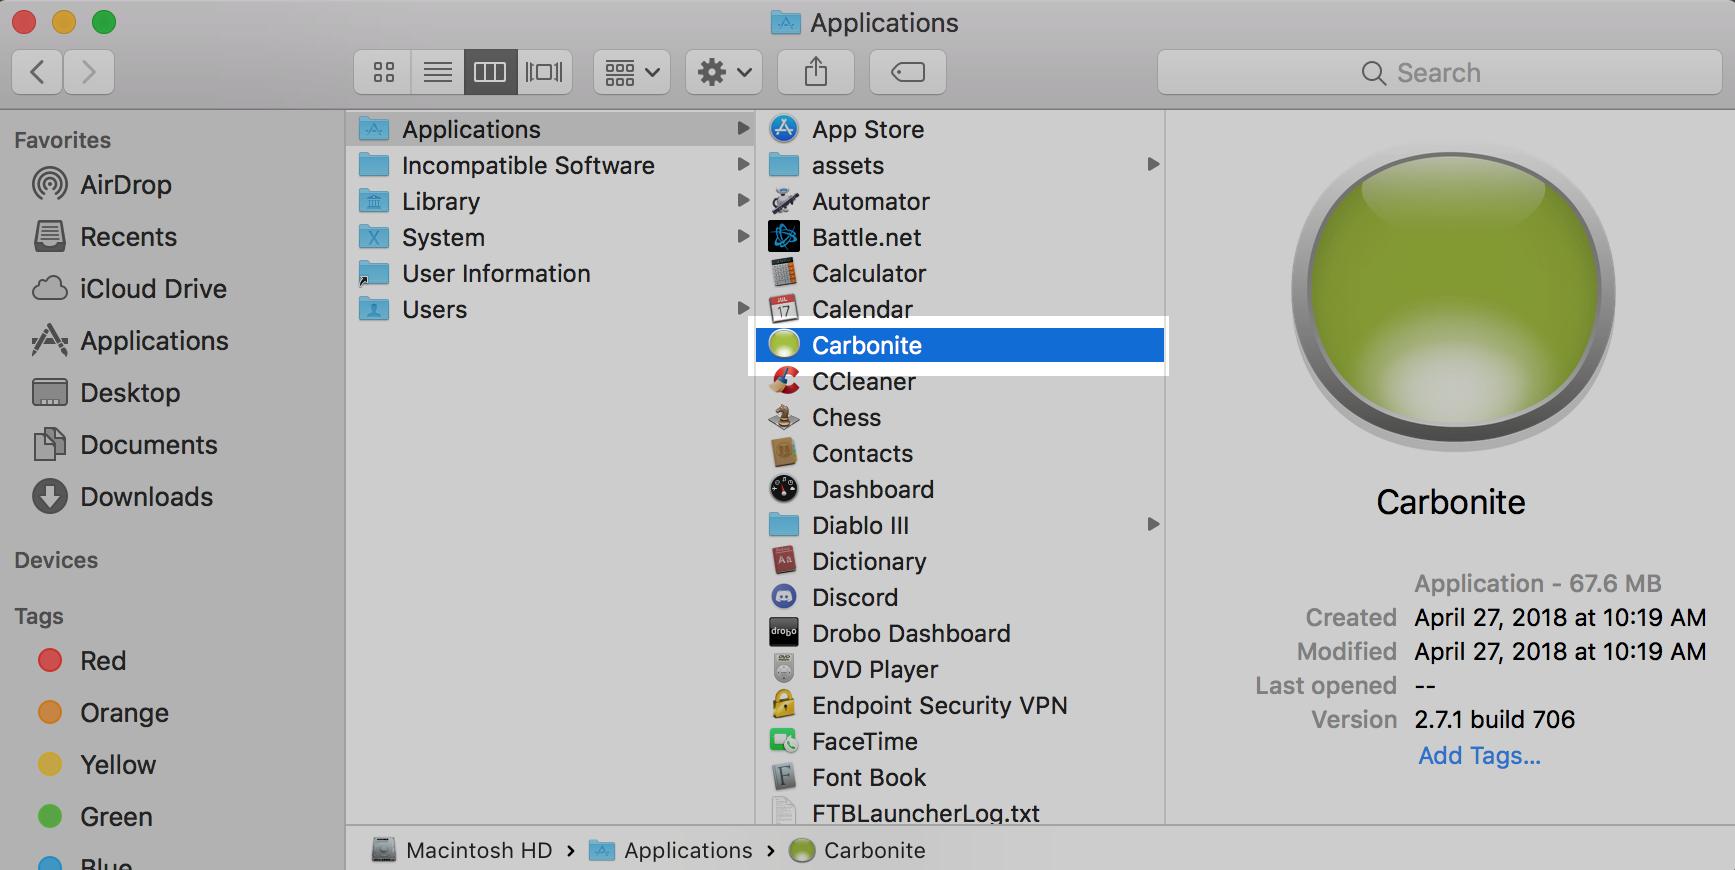 Remove the Carbonite Folder